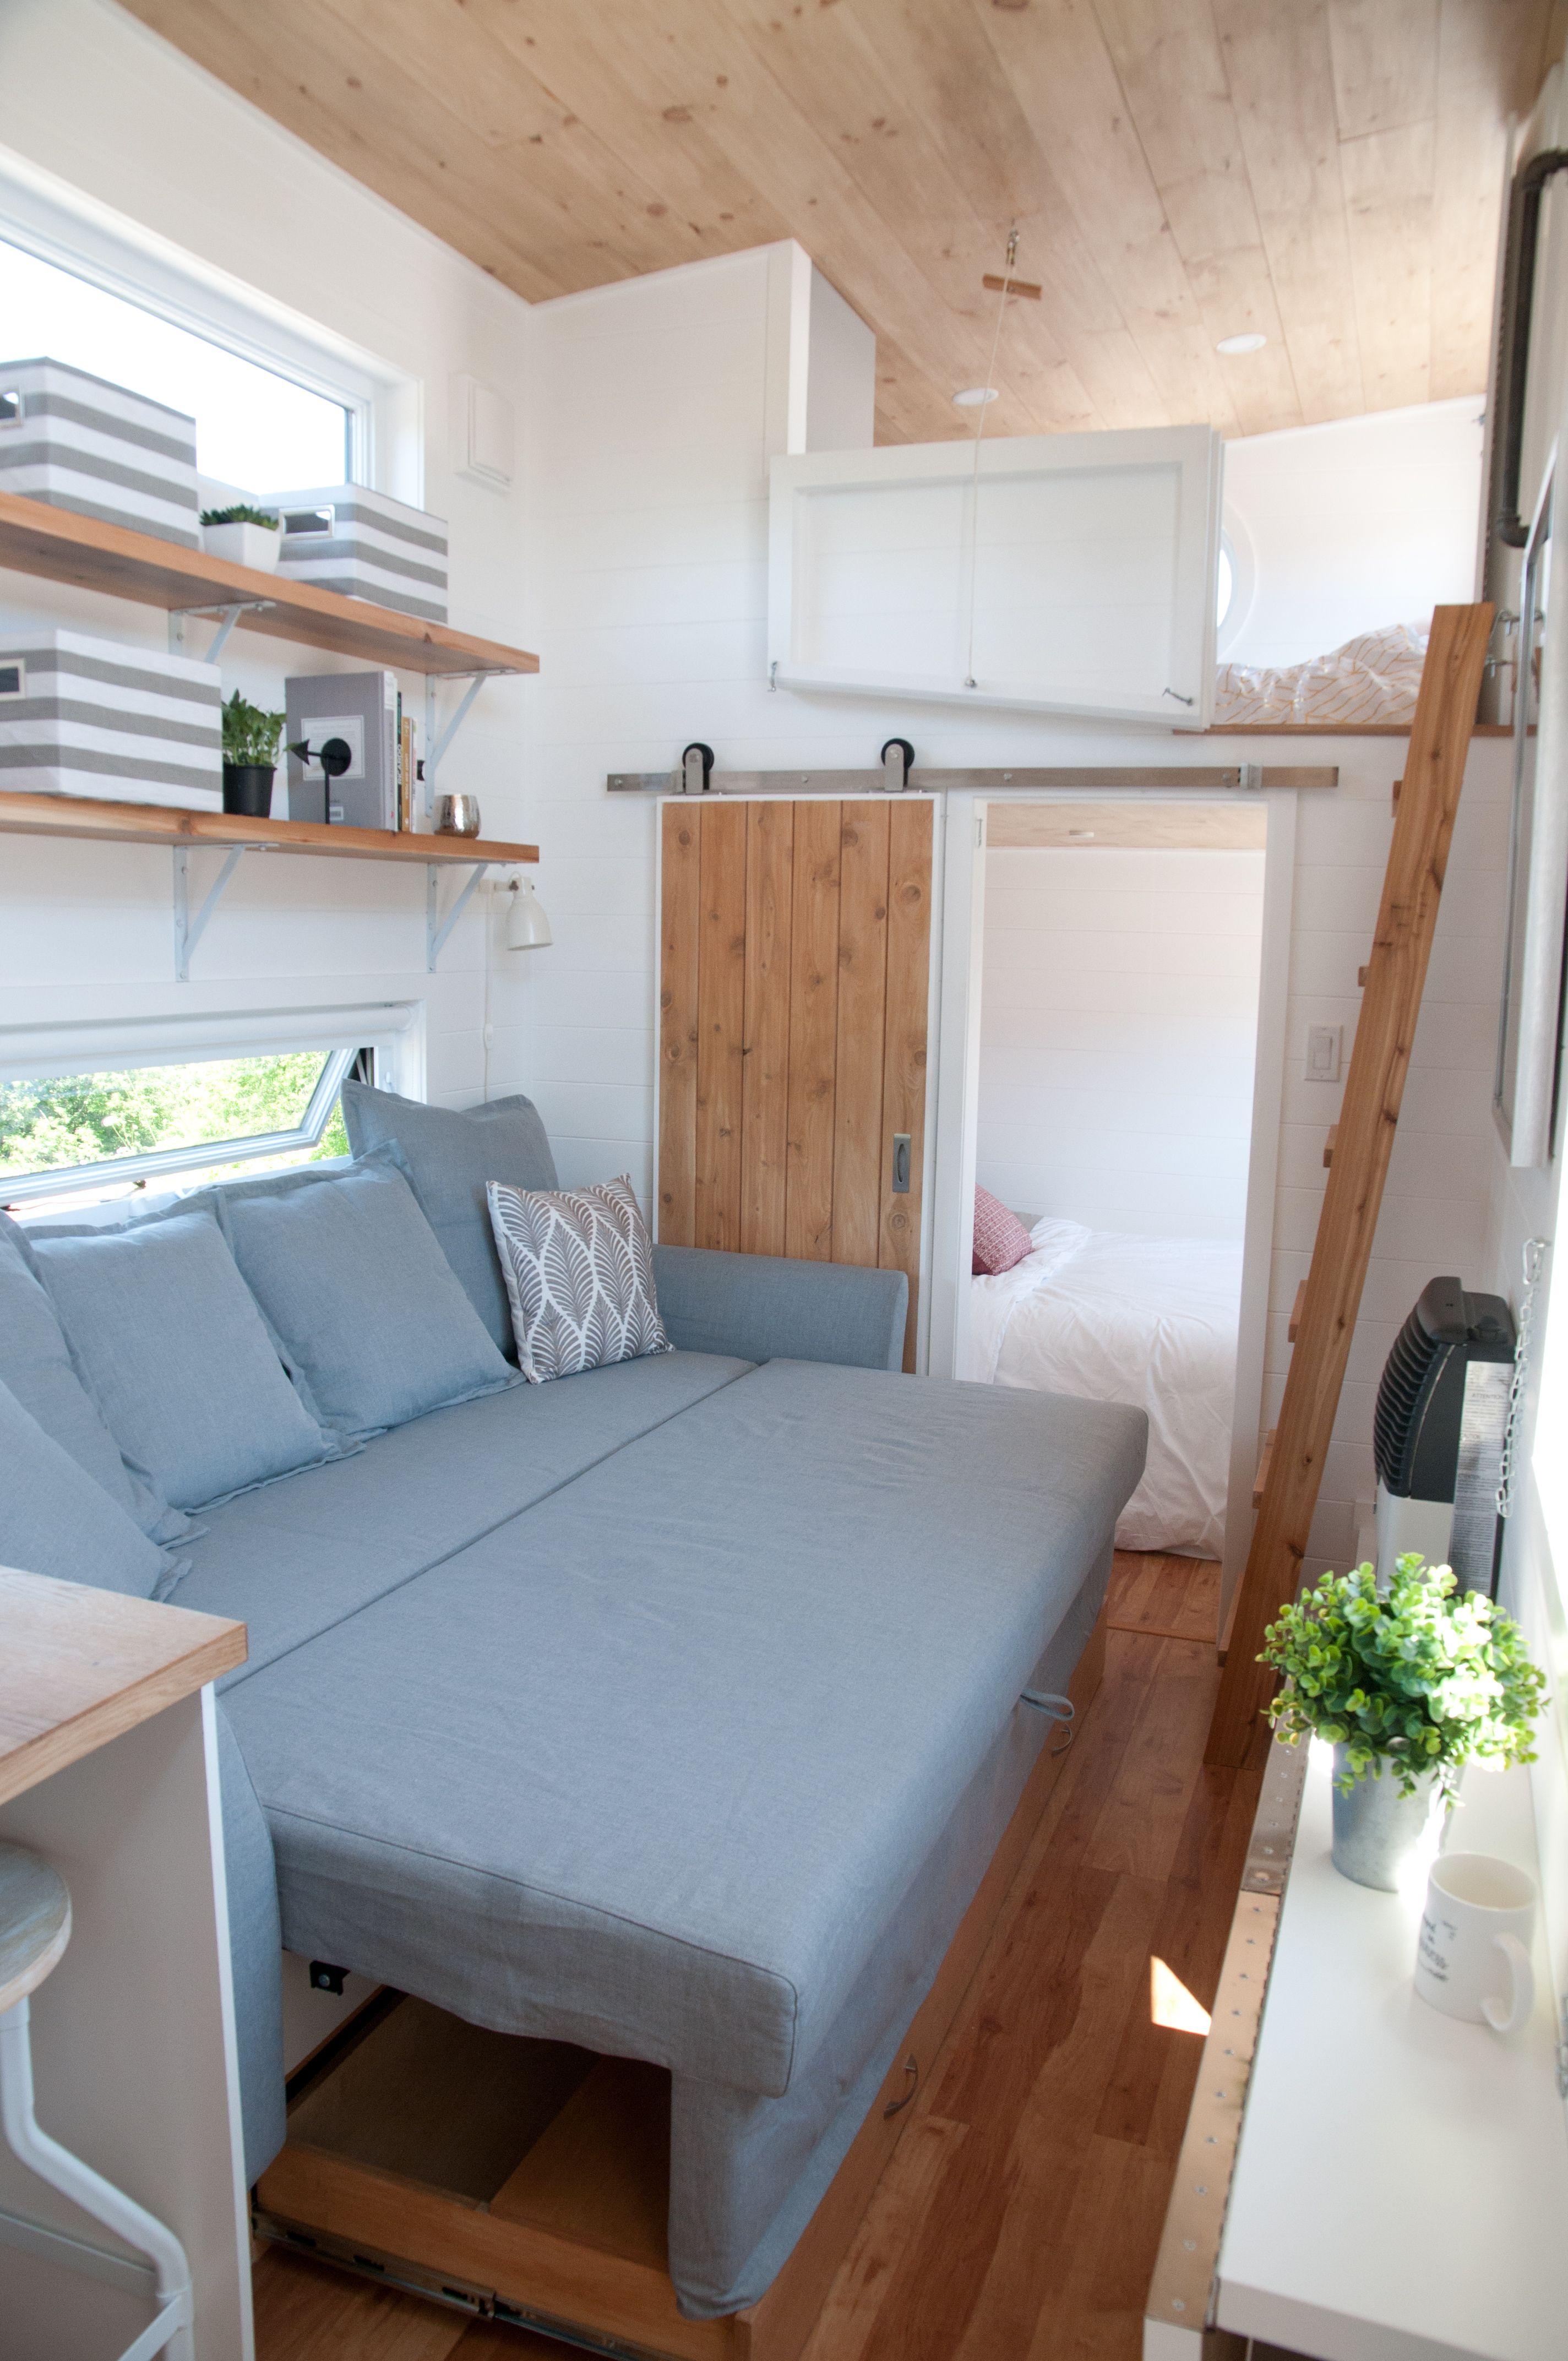 Sofa Bed Tinyhouse Minimaliste Minimaliste Tiny House